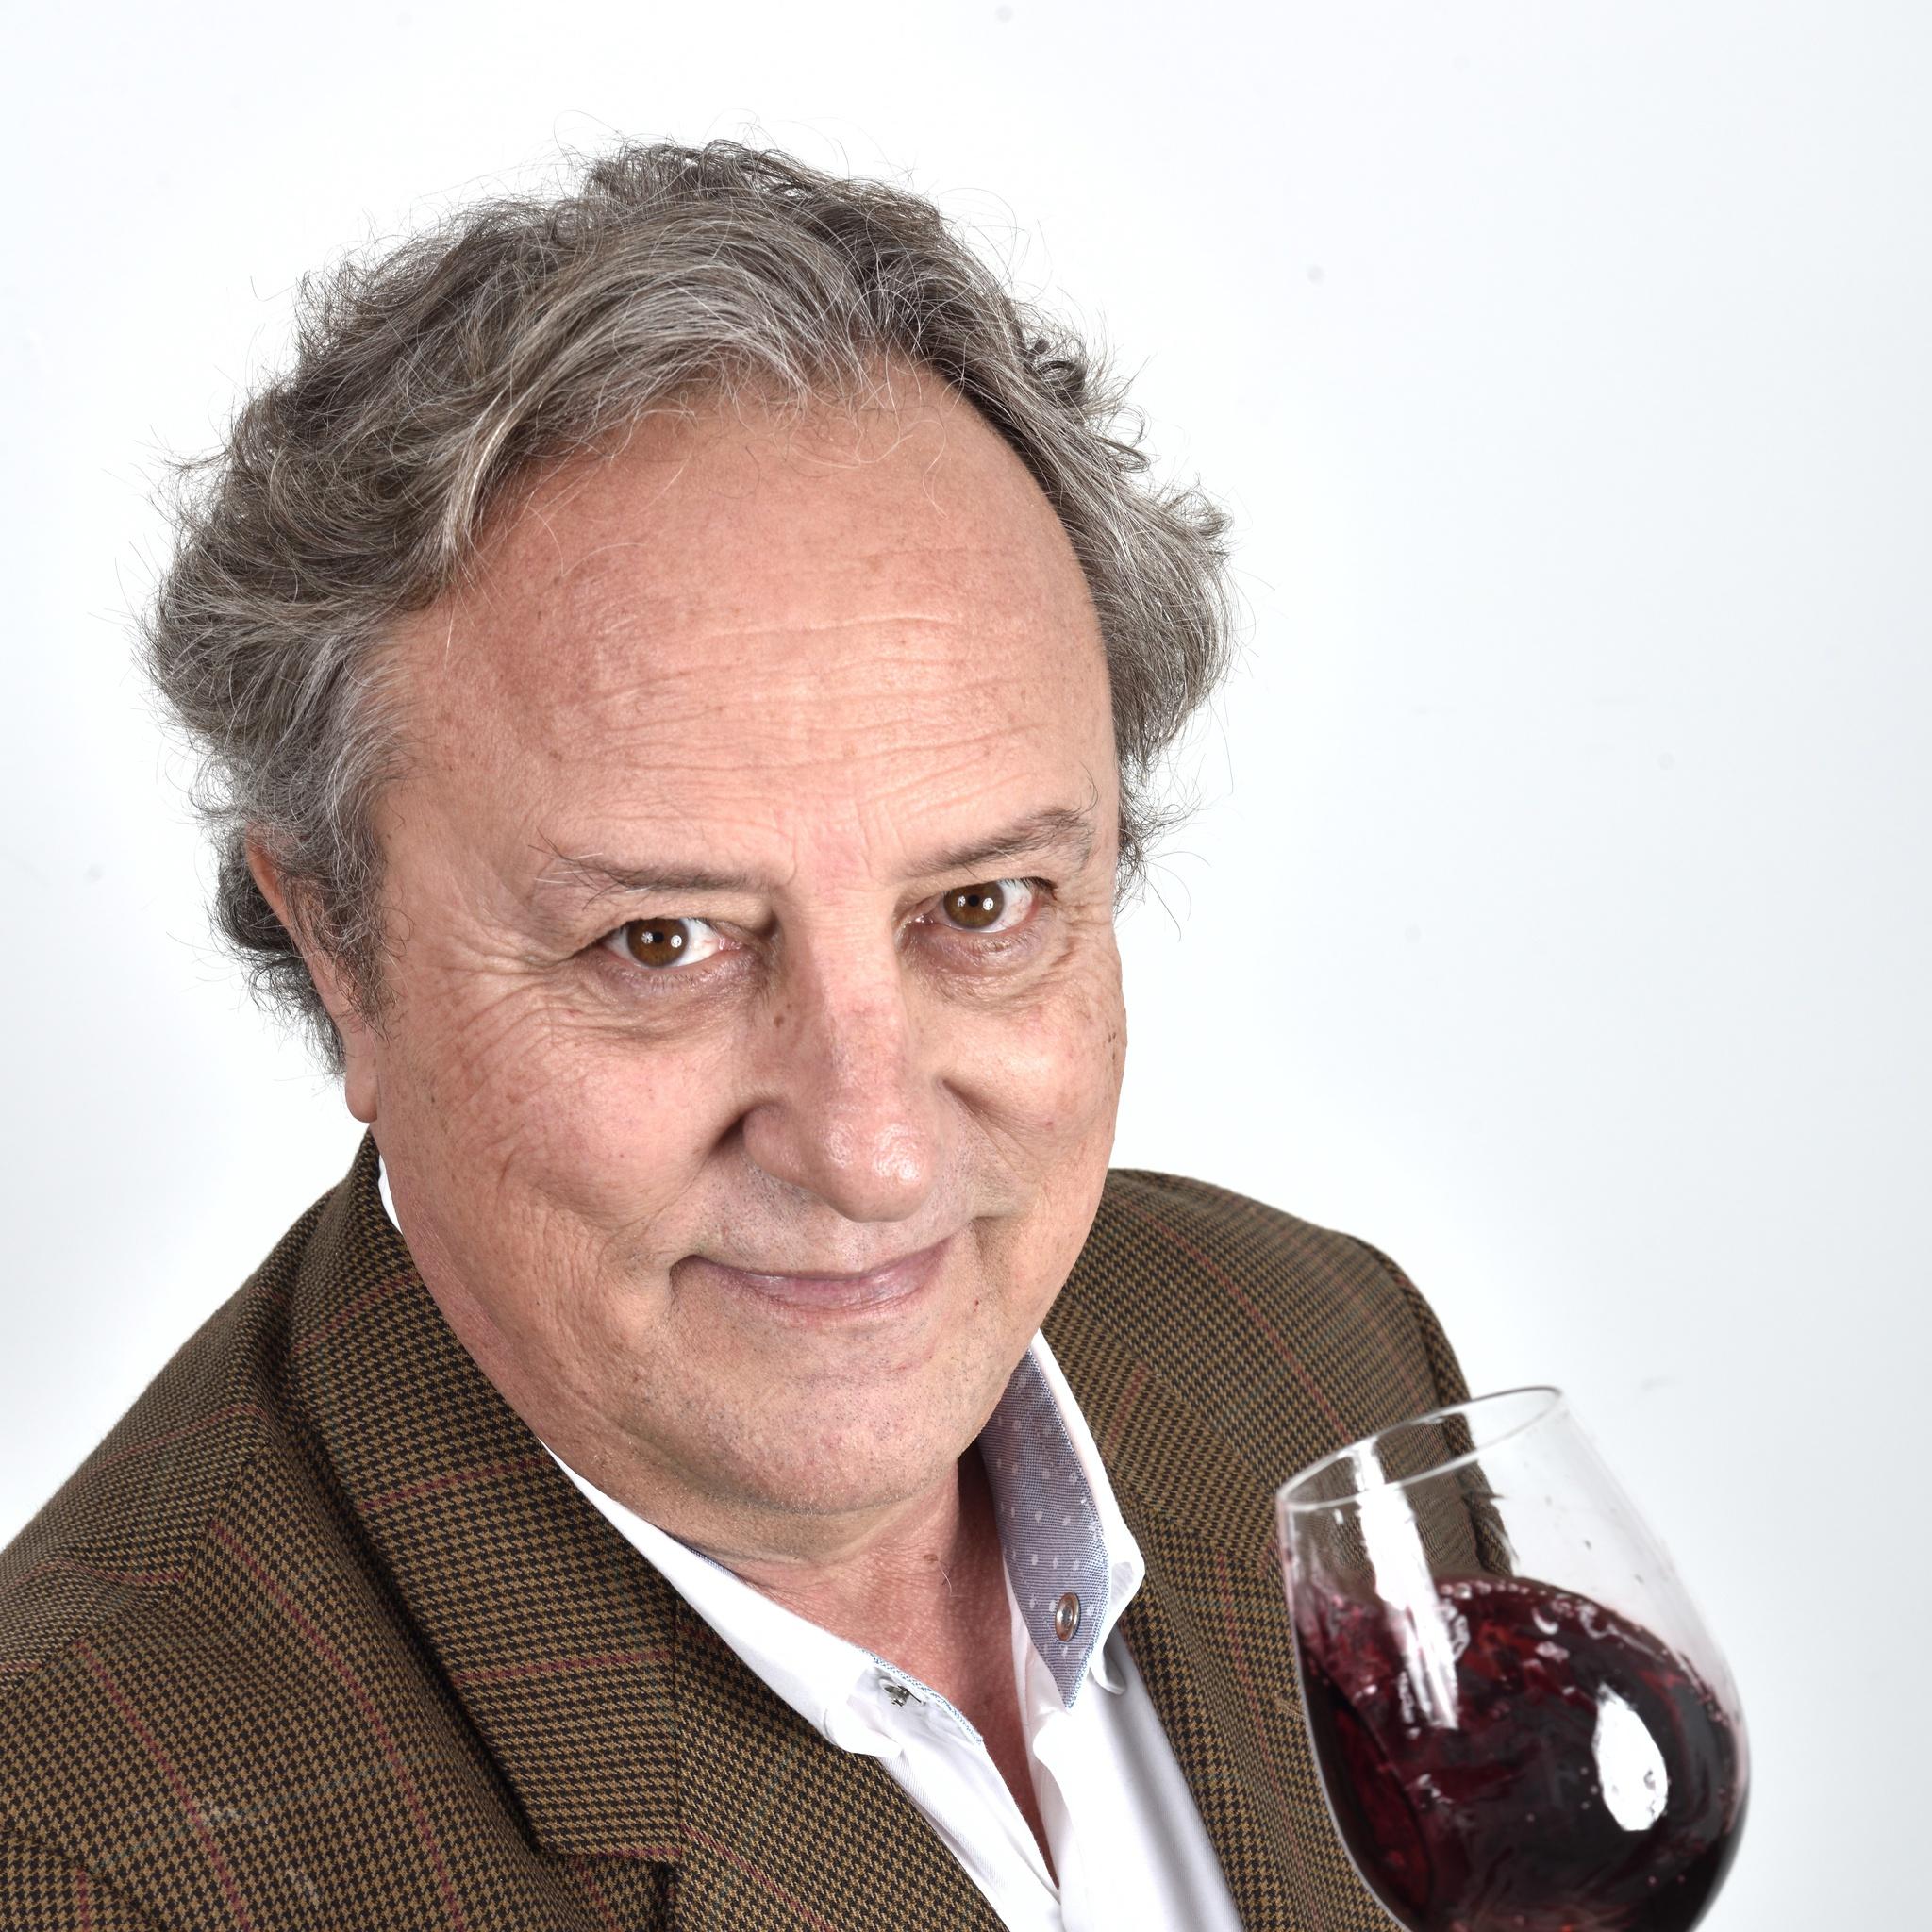 João Paulo Martins